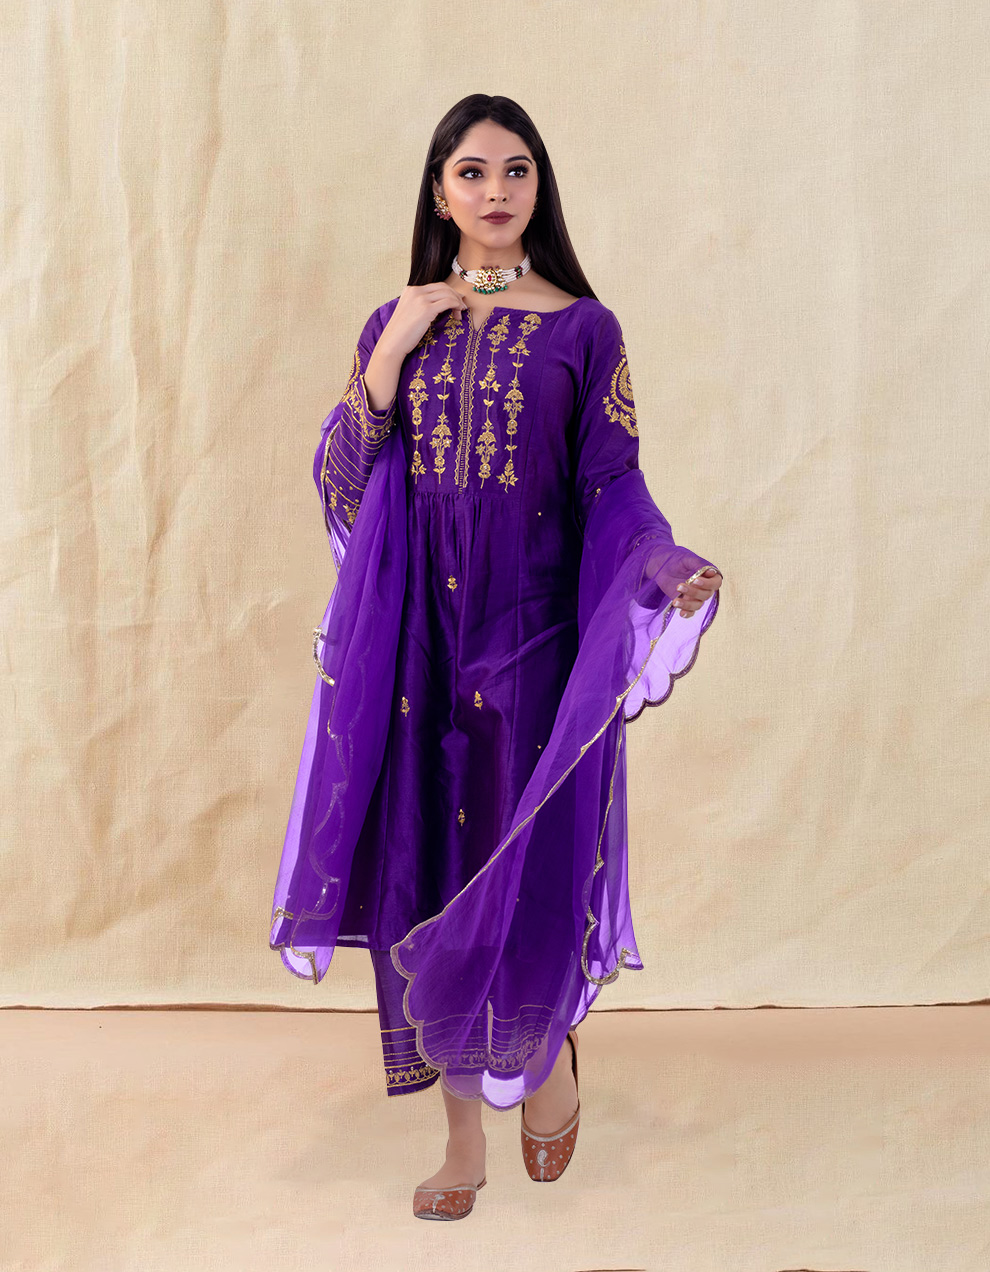 Purple hand embroidered chanderi silk kurta for sale in India